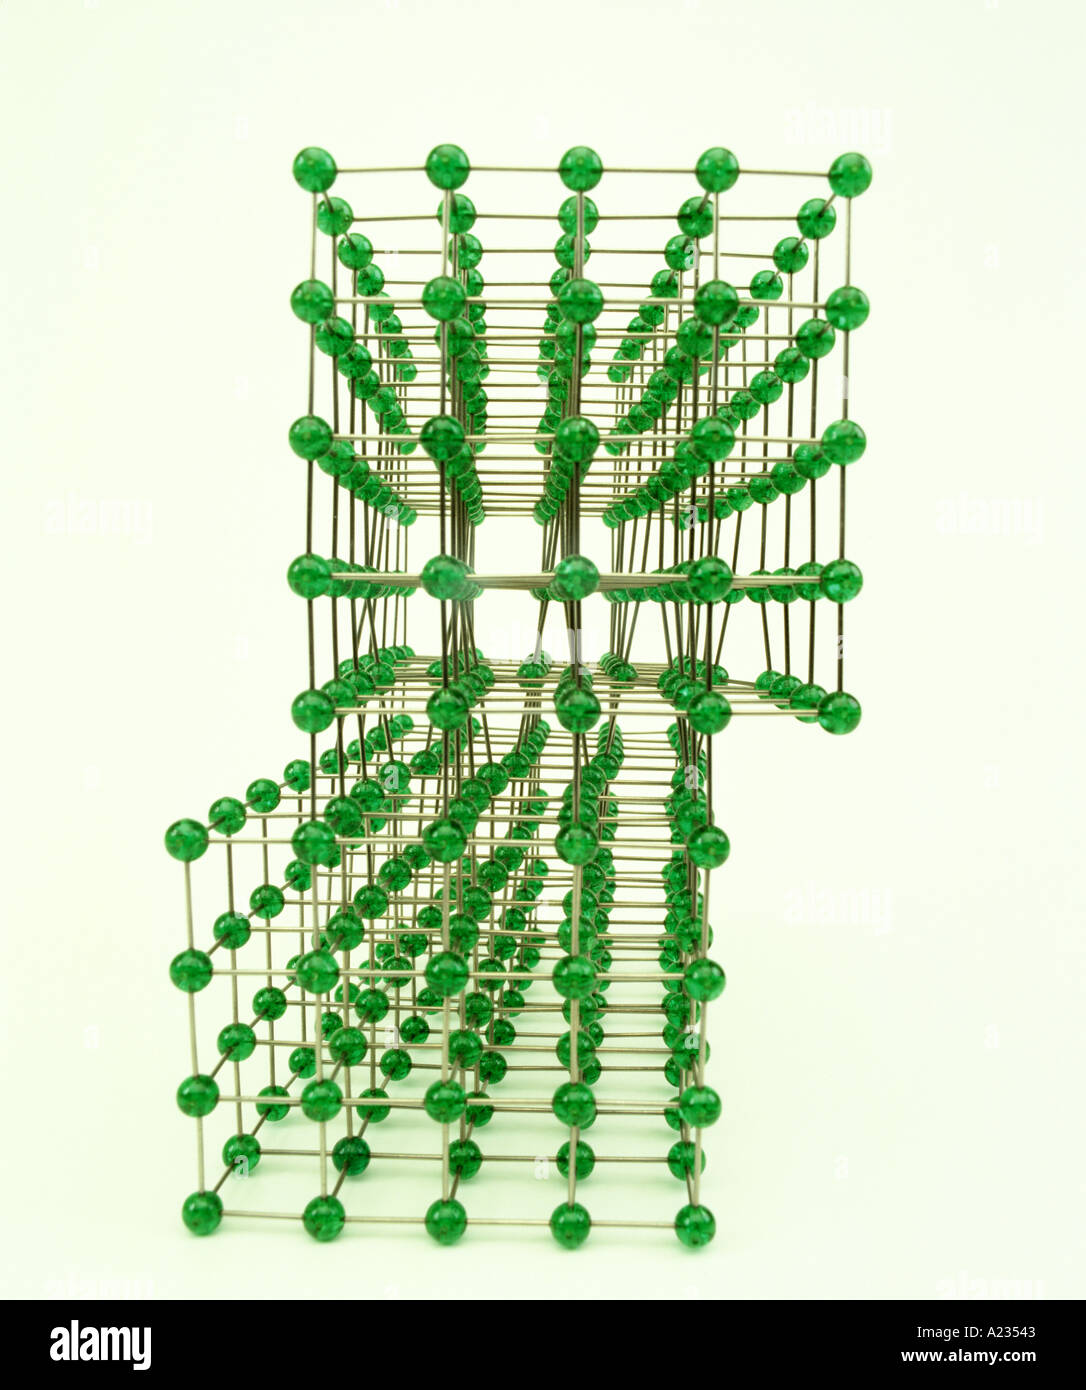 molecular model of a screw dislocation - Stock Image